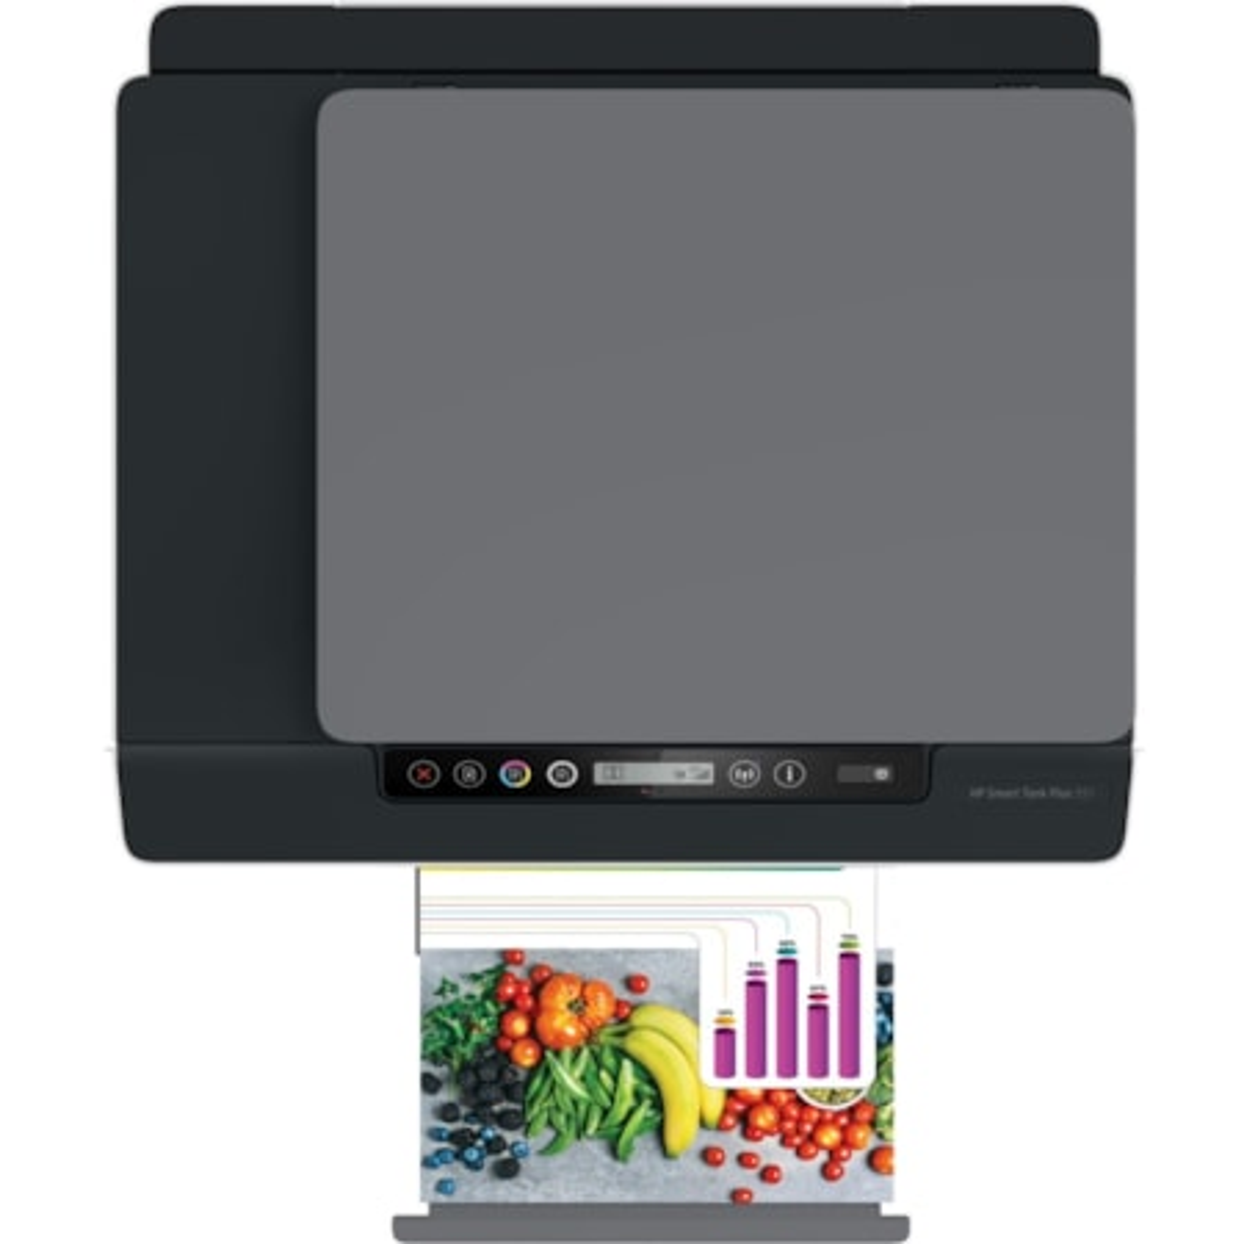 HP Smart Tank Plus 550 551 Inkjet Multifunction Printer - Colour